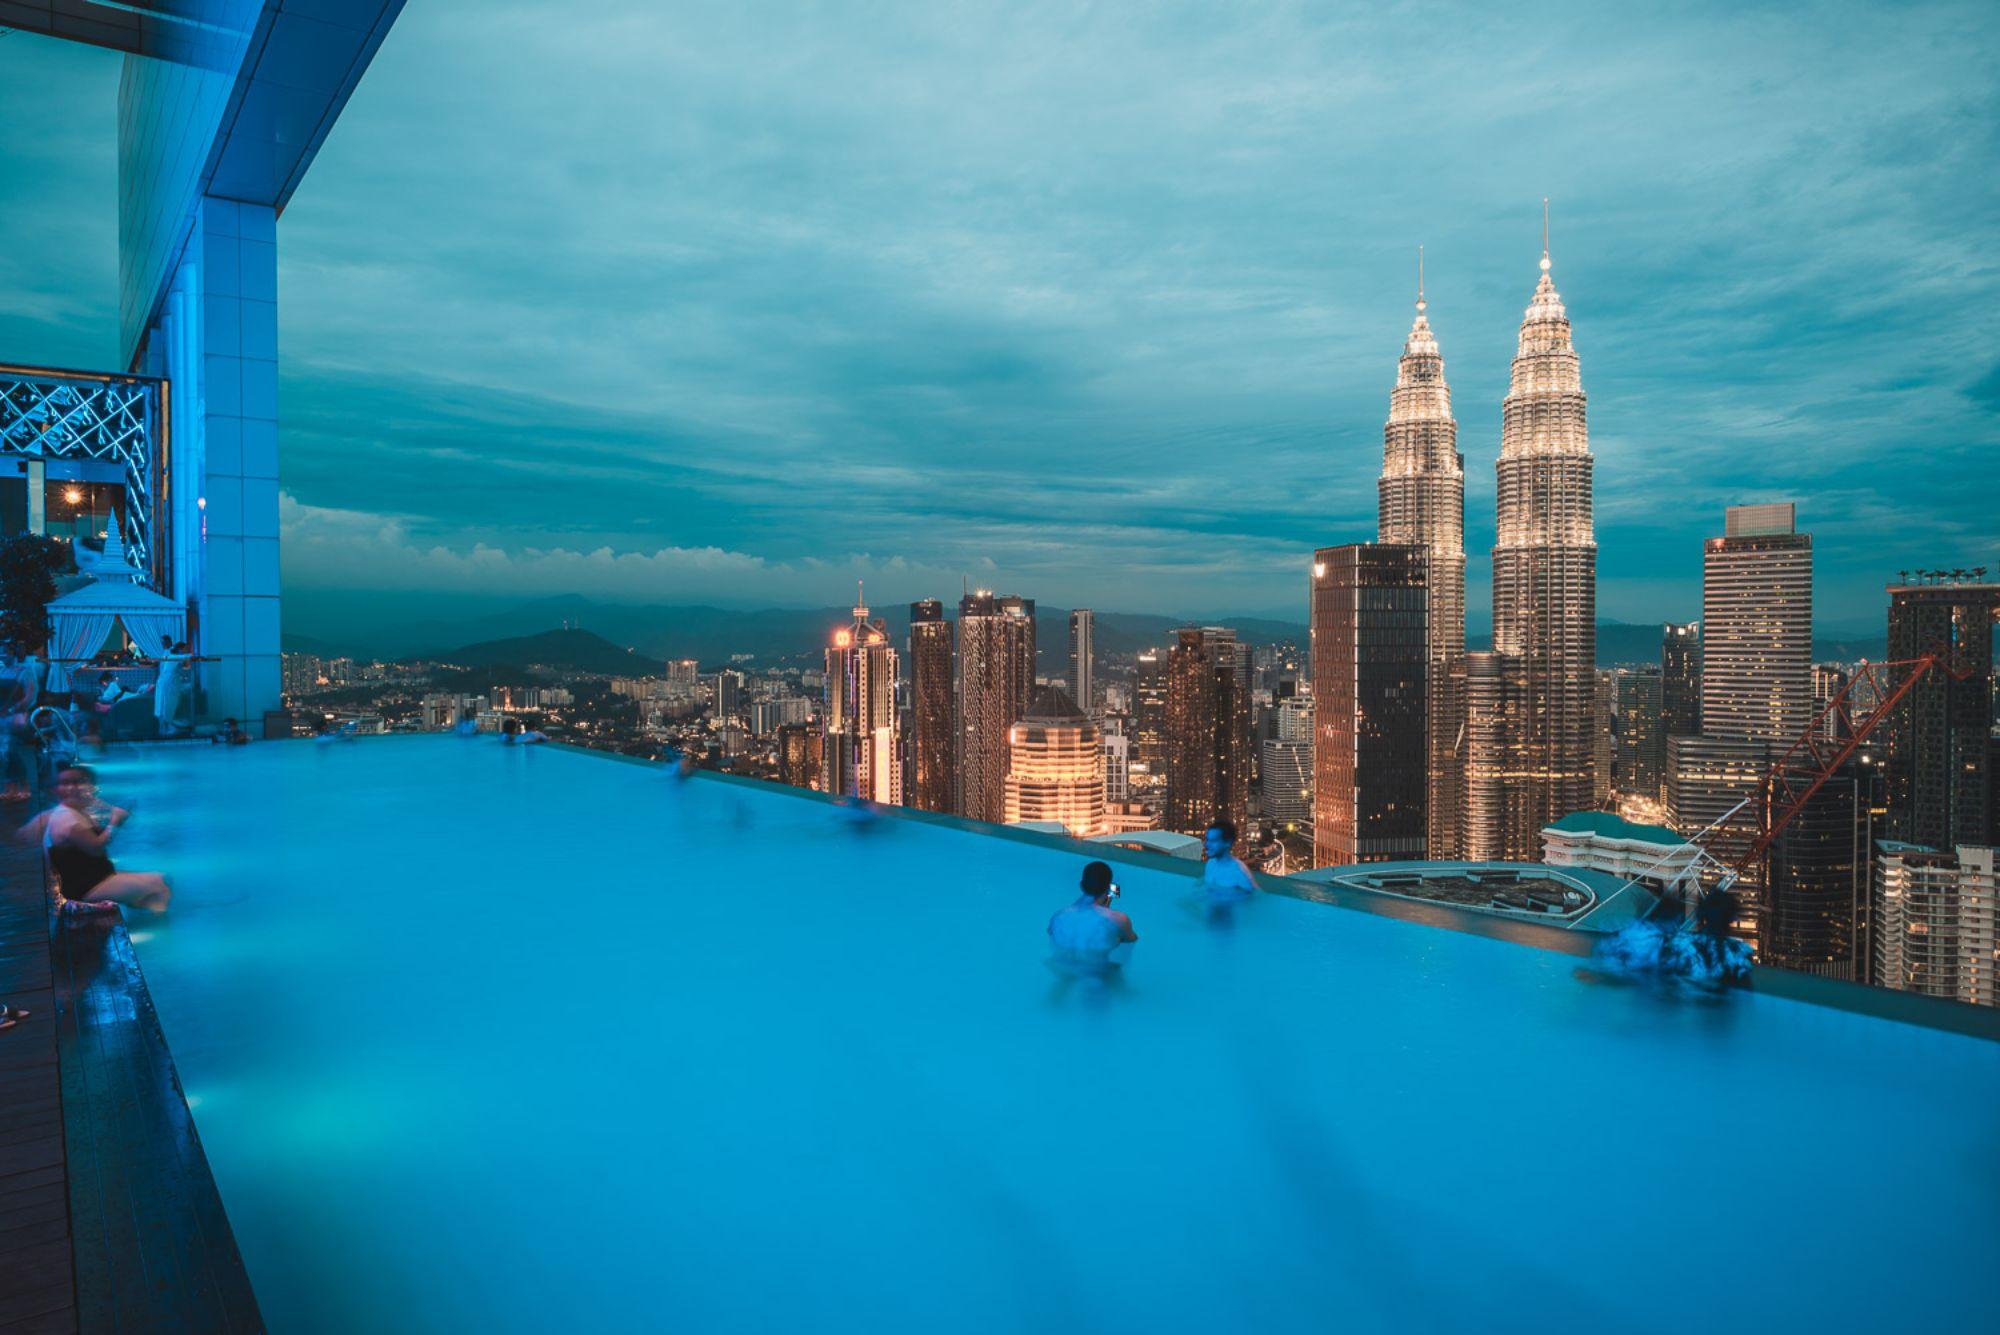 De leukste dingen om te doen in Kuala Lumpur